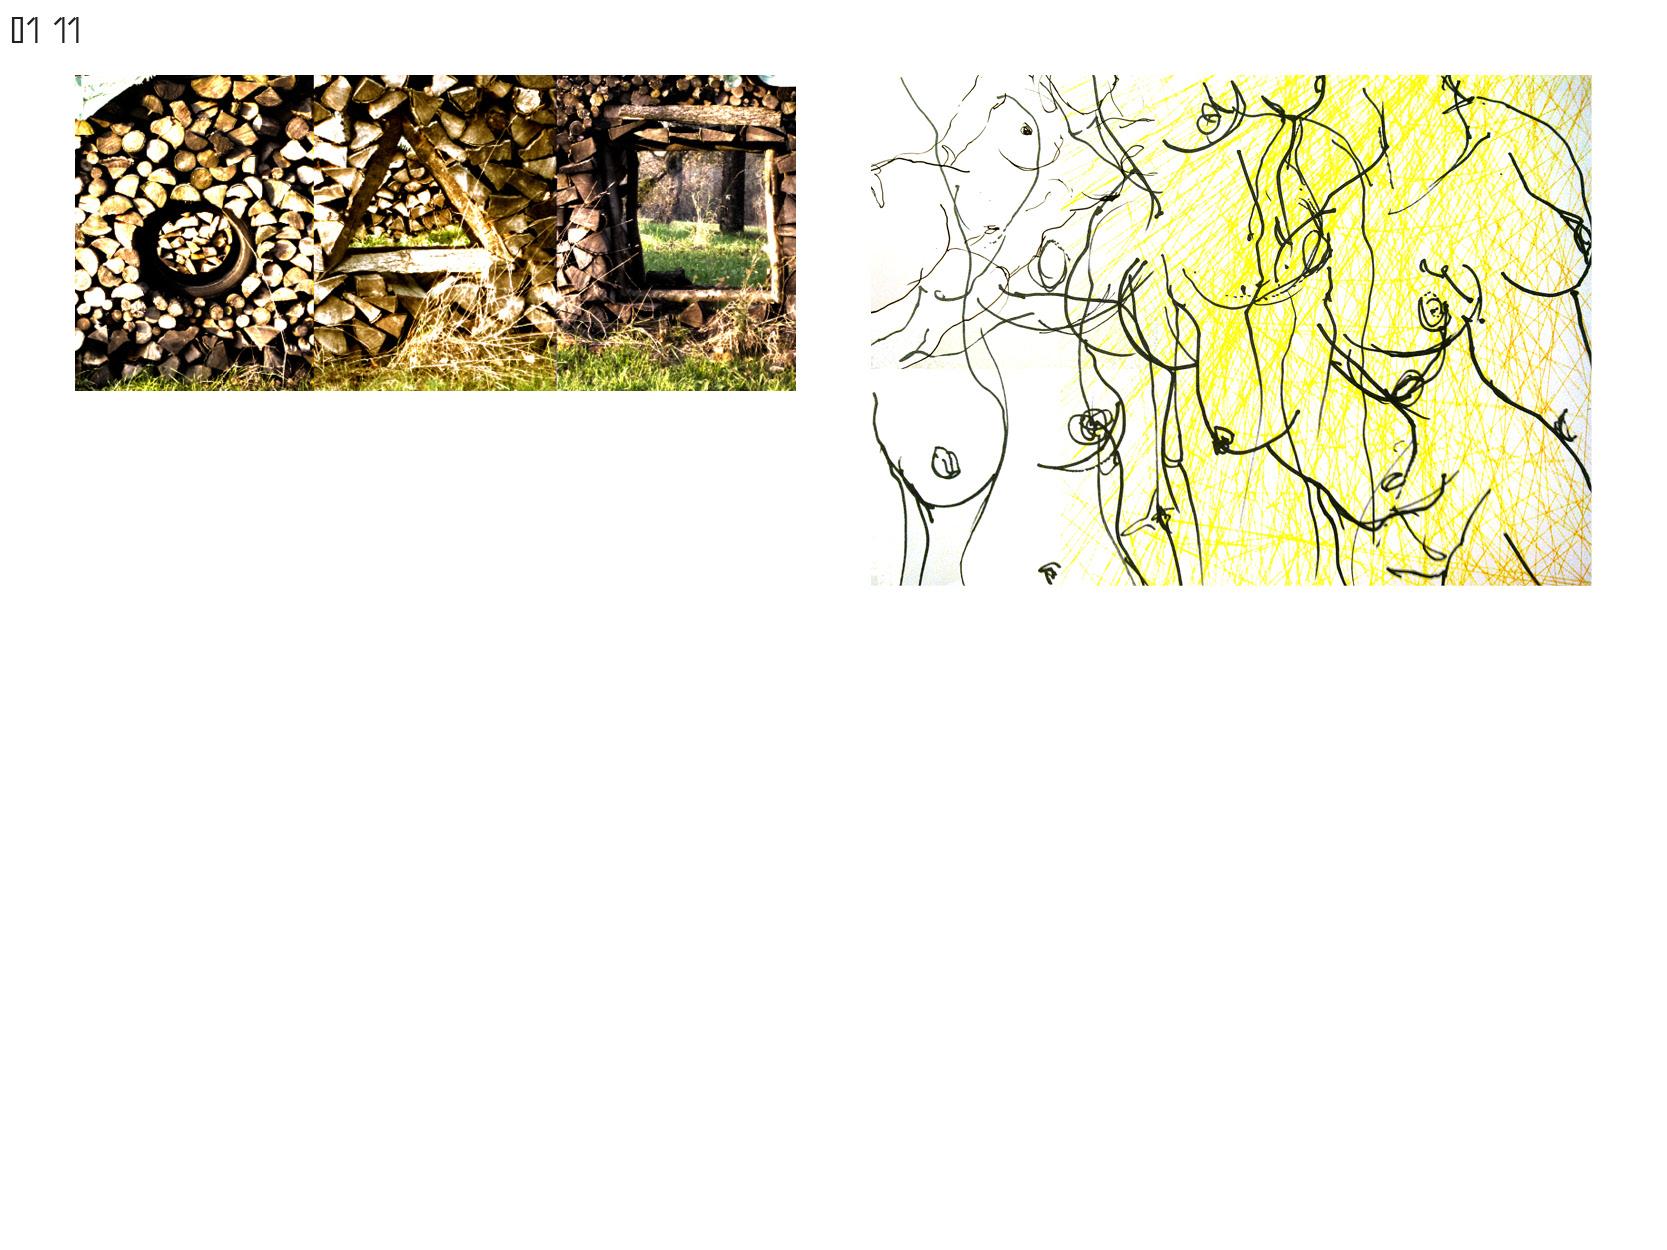 Gerrit-Schweiger-Dialog-Städte-Paris-Berlin-Jessica-Blank-Experiment-Fotoserie-Tagebuch-visuelle-Kommunikation-16